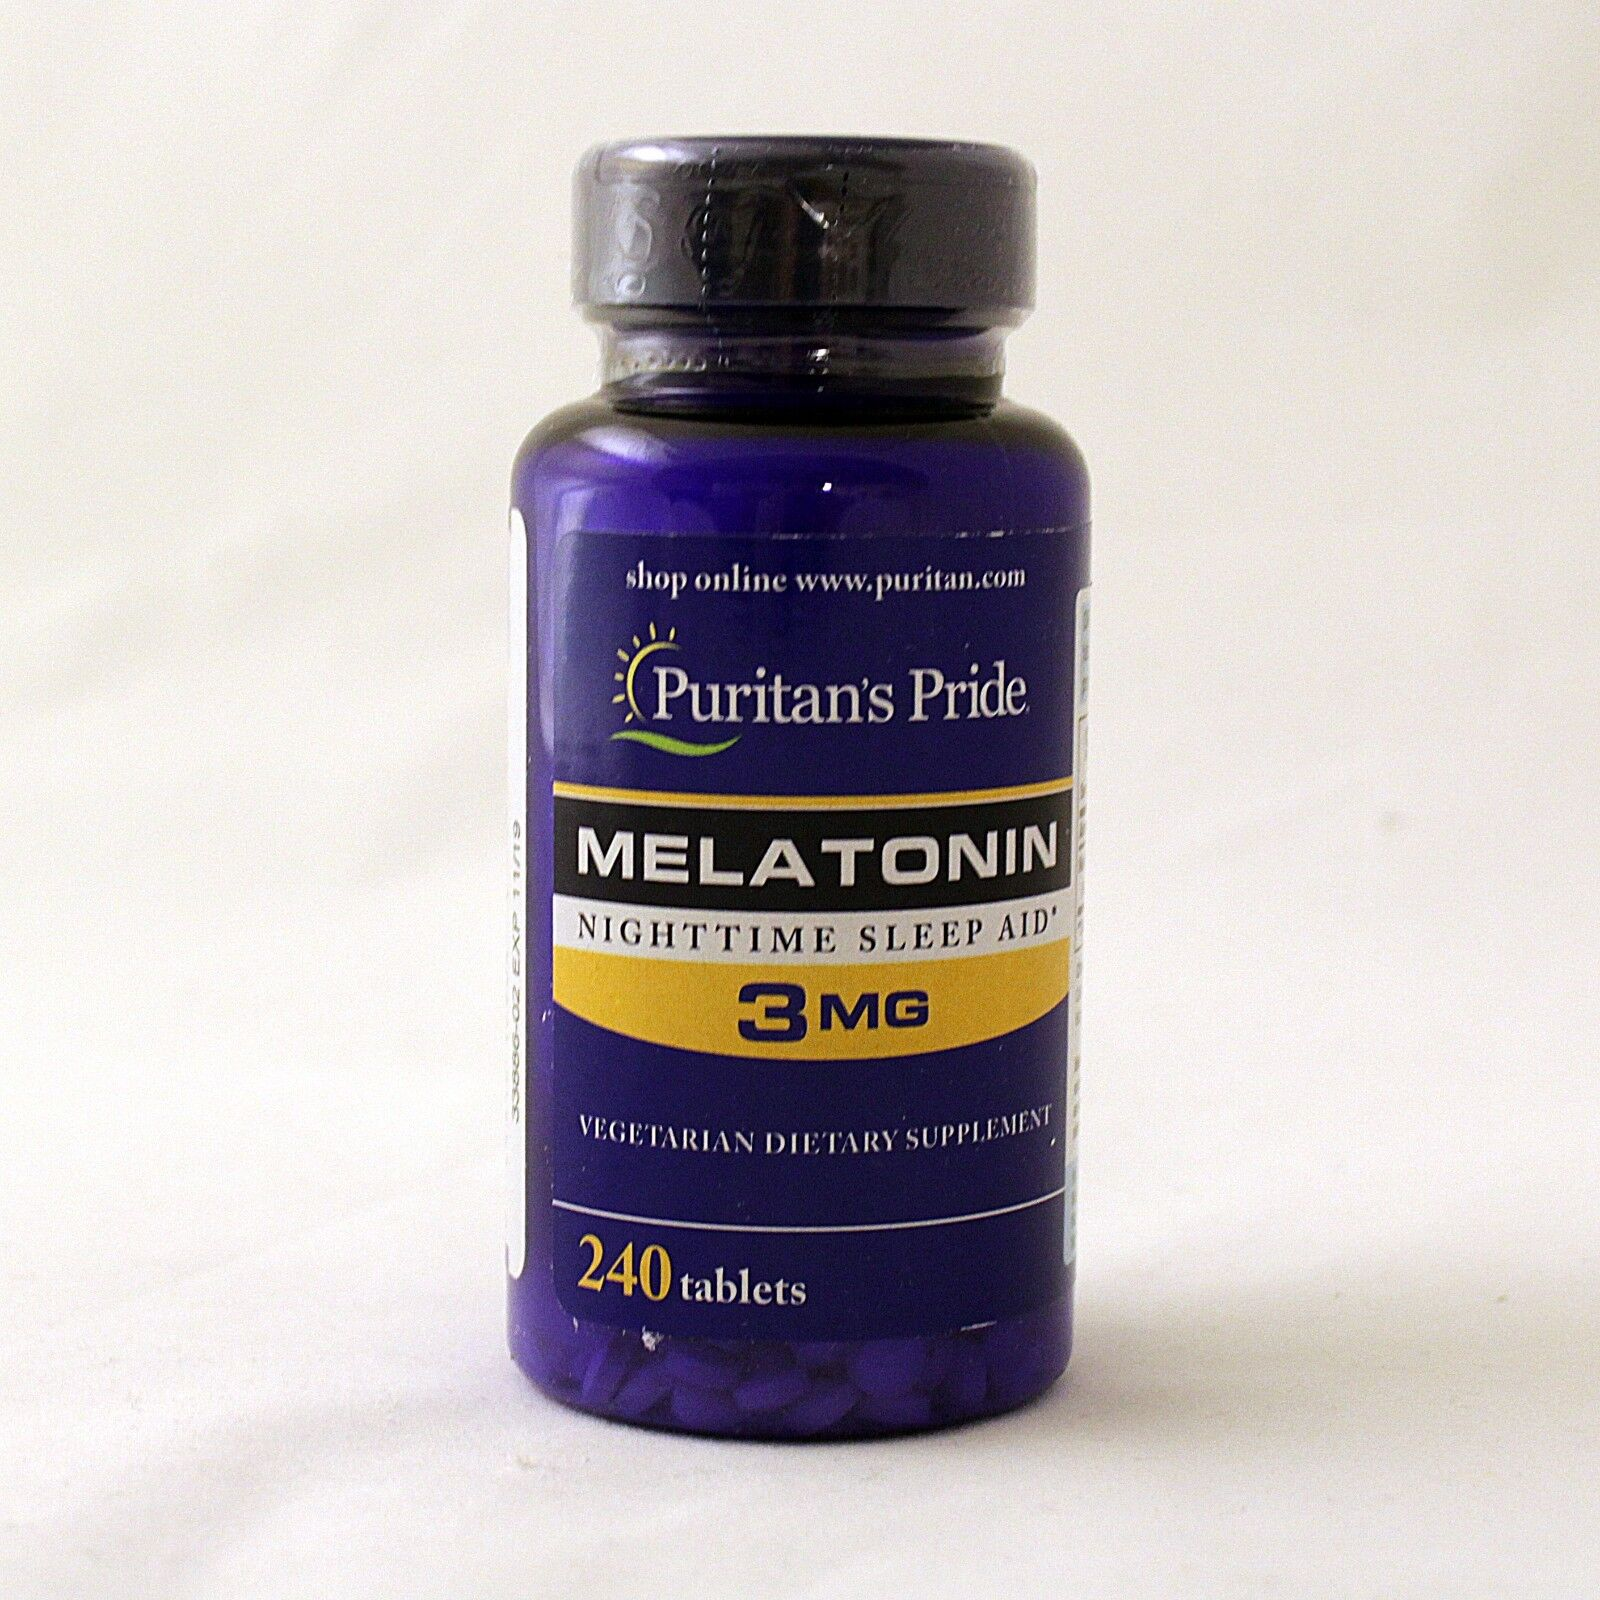 Puritan's Pride Melatonin 3 mg 240 Tablets Sleep Aid 2 x 120